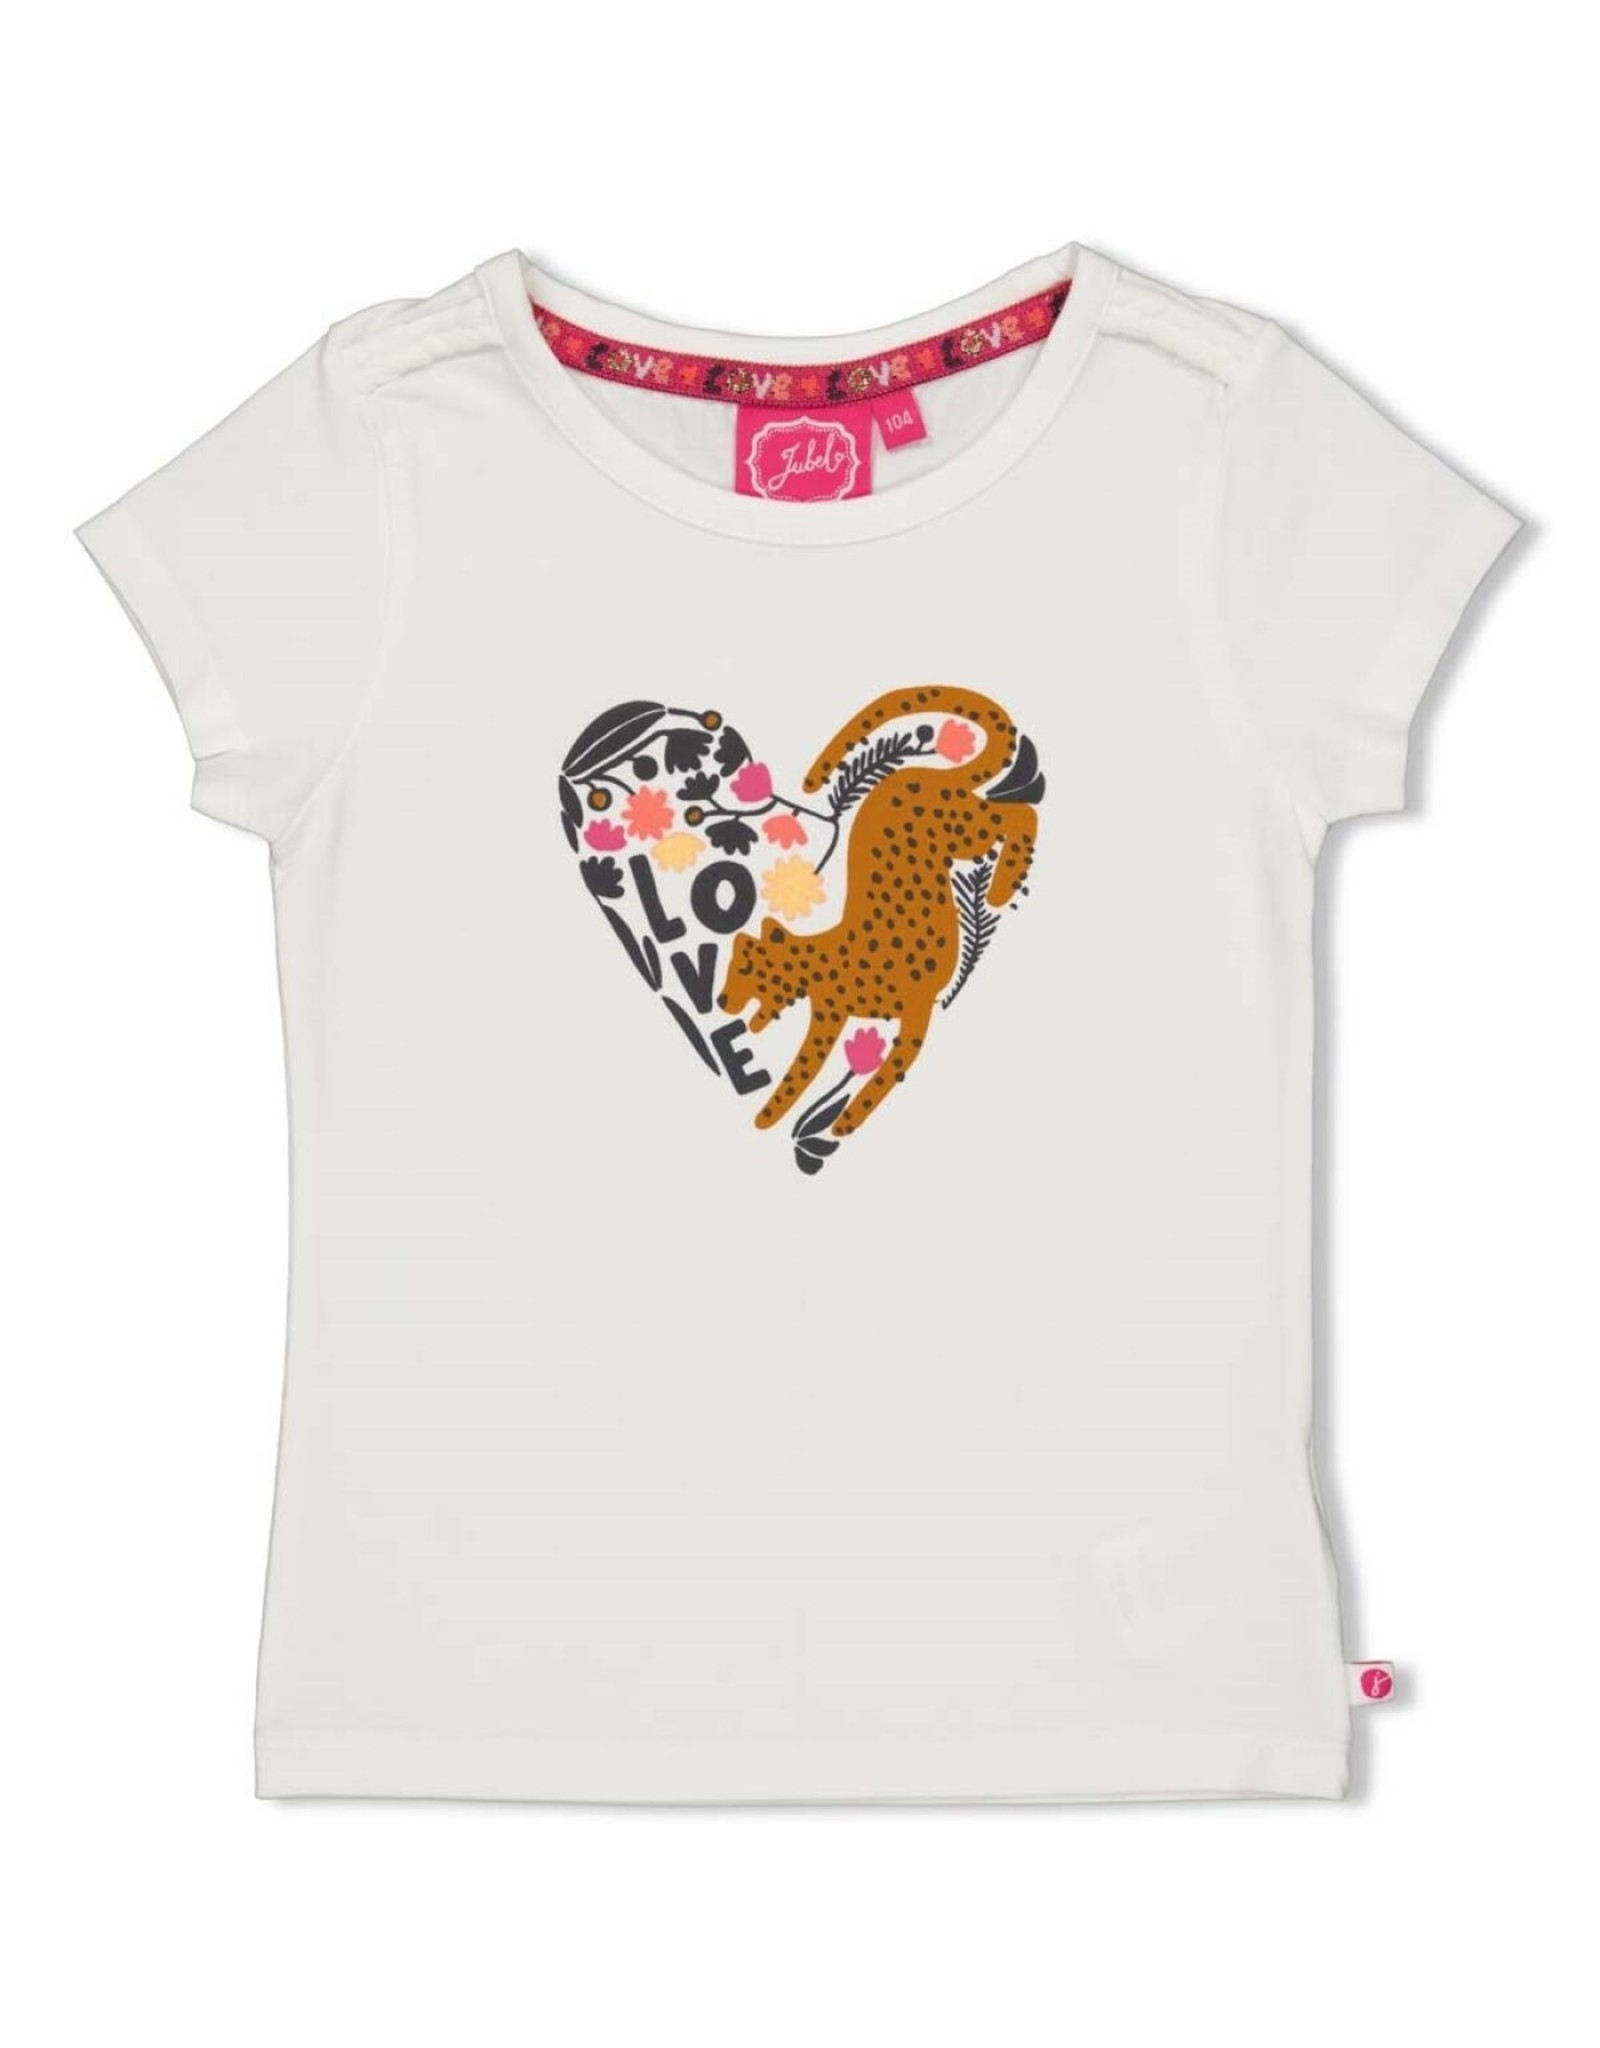 Jubel 91700284 T-Shirt